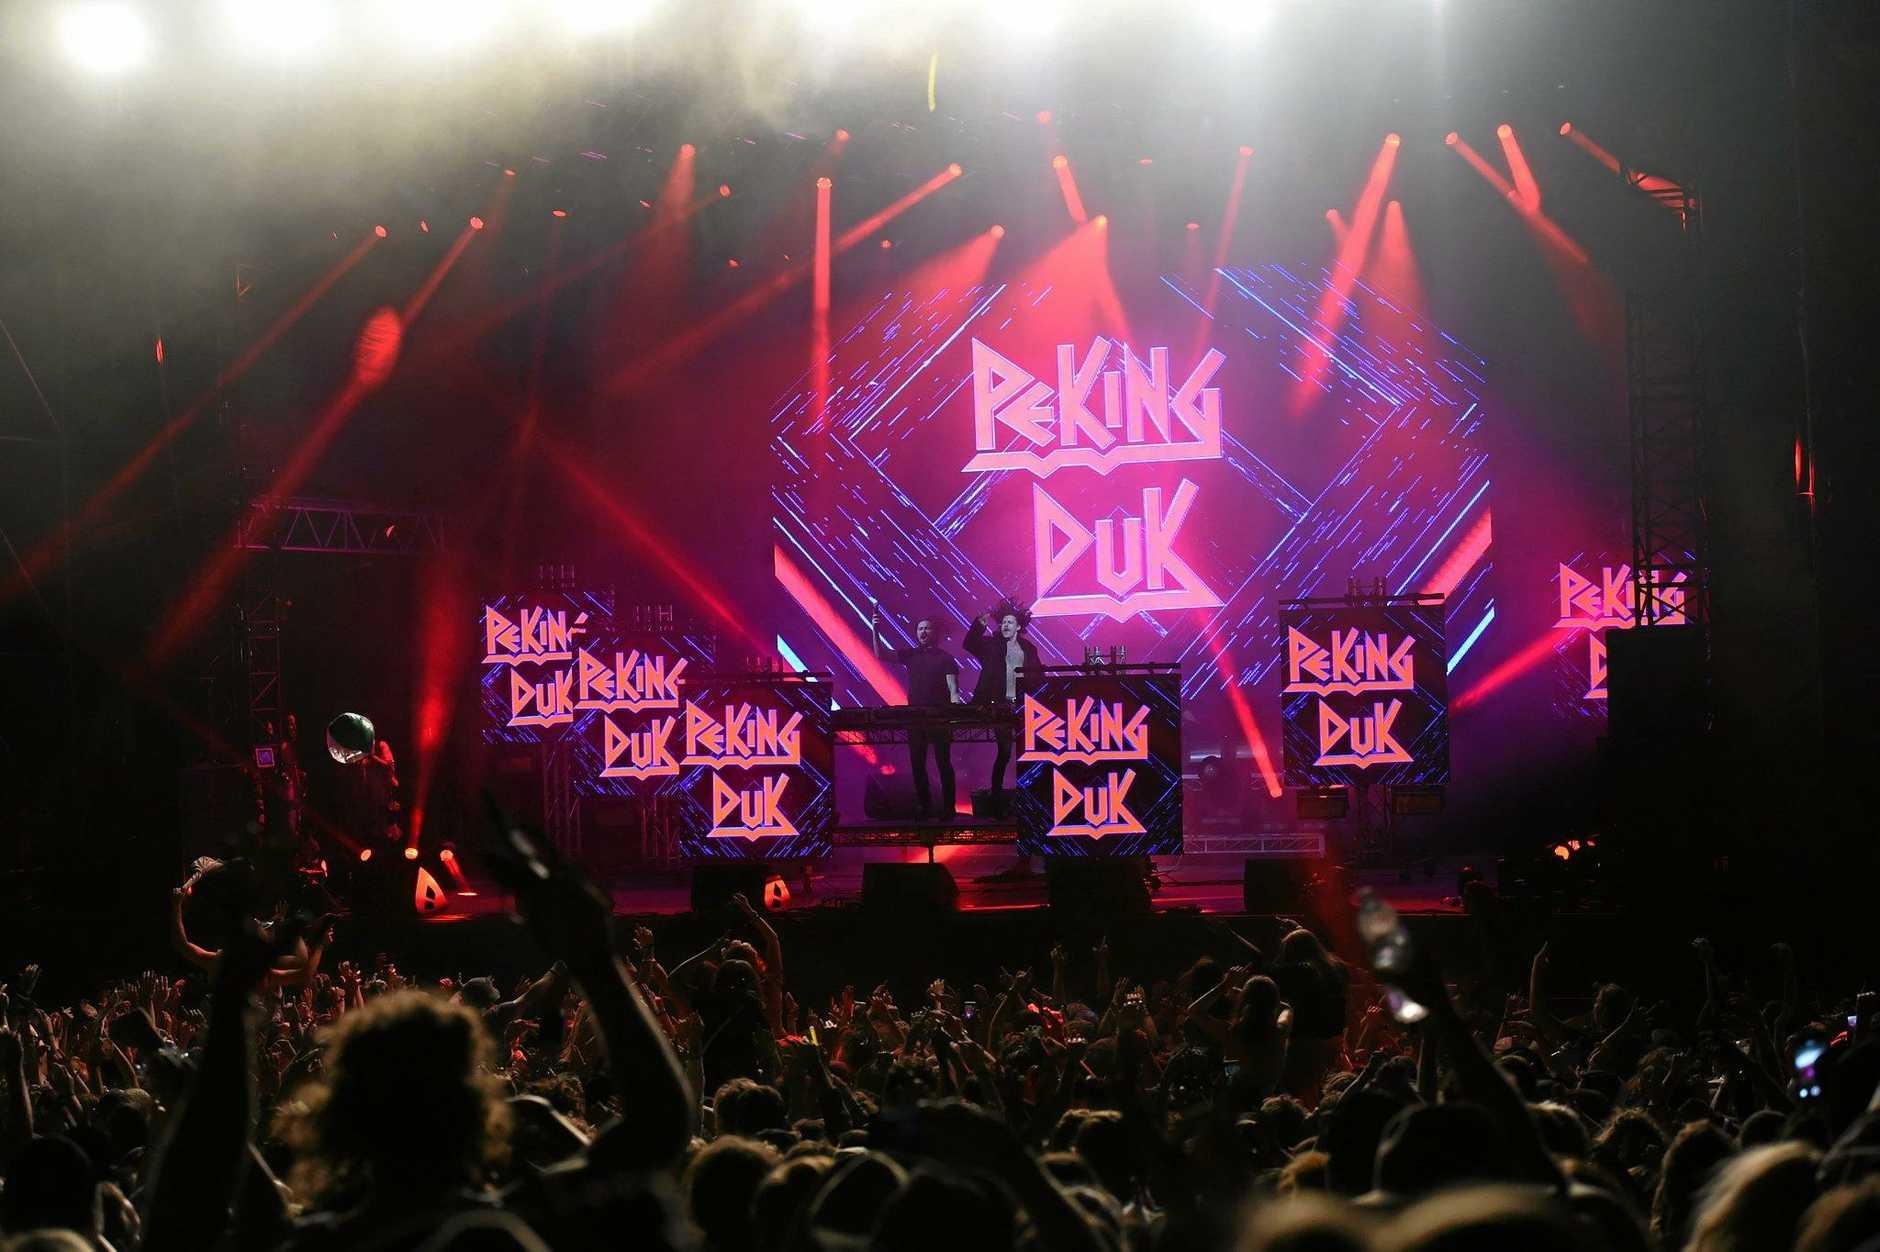 Peking DuK at Falls Festival 2016 in Byron Bay at the Byron Bay Parklands.  Photo Marc Stapelberg / The Northern Star